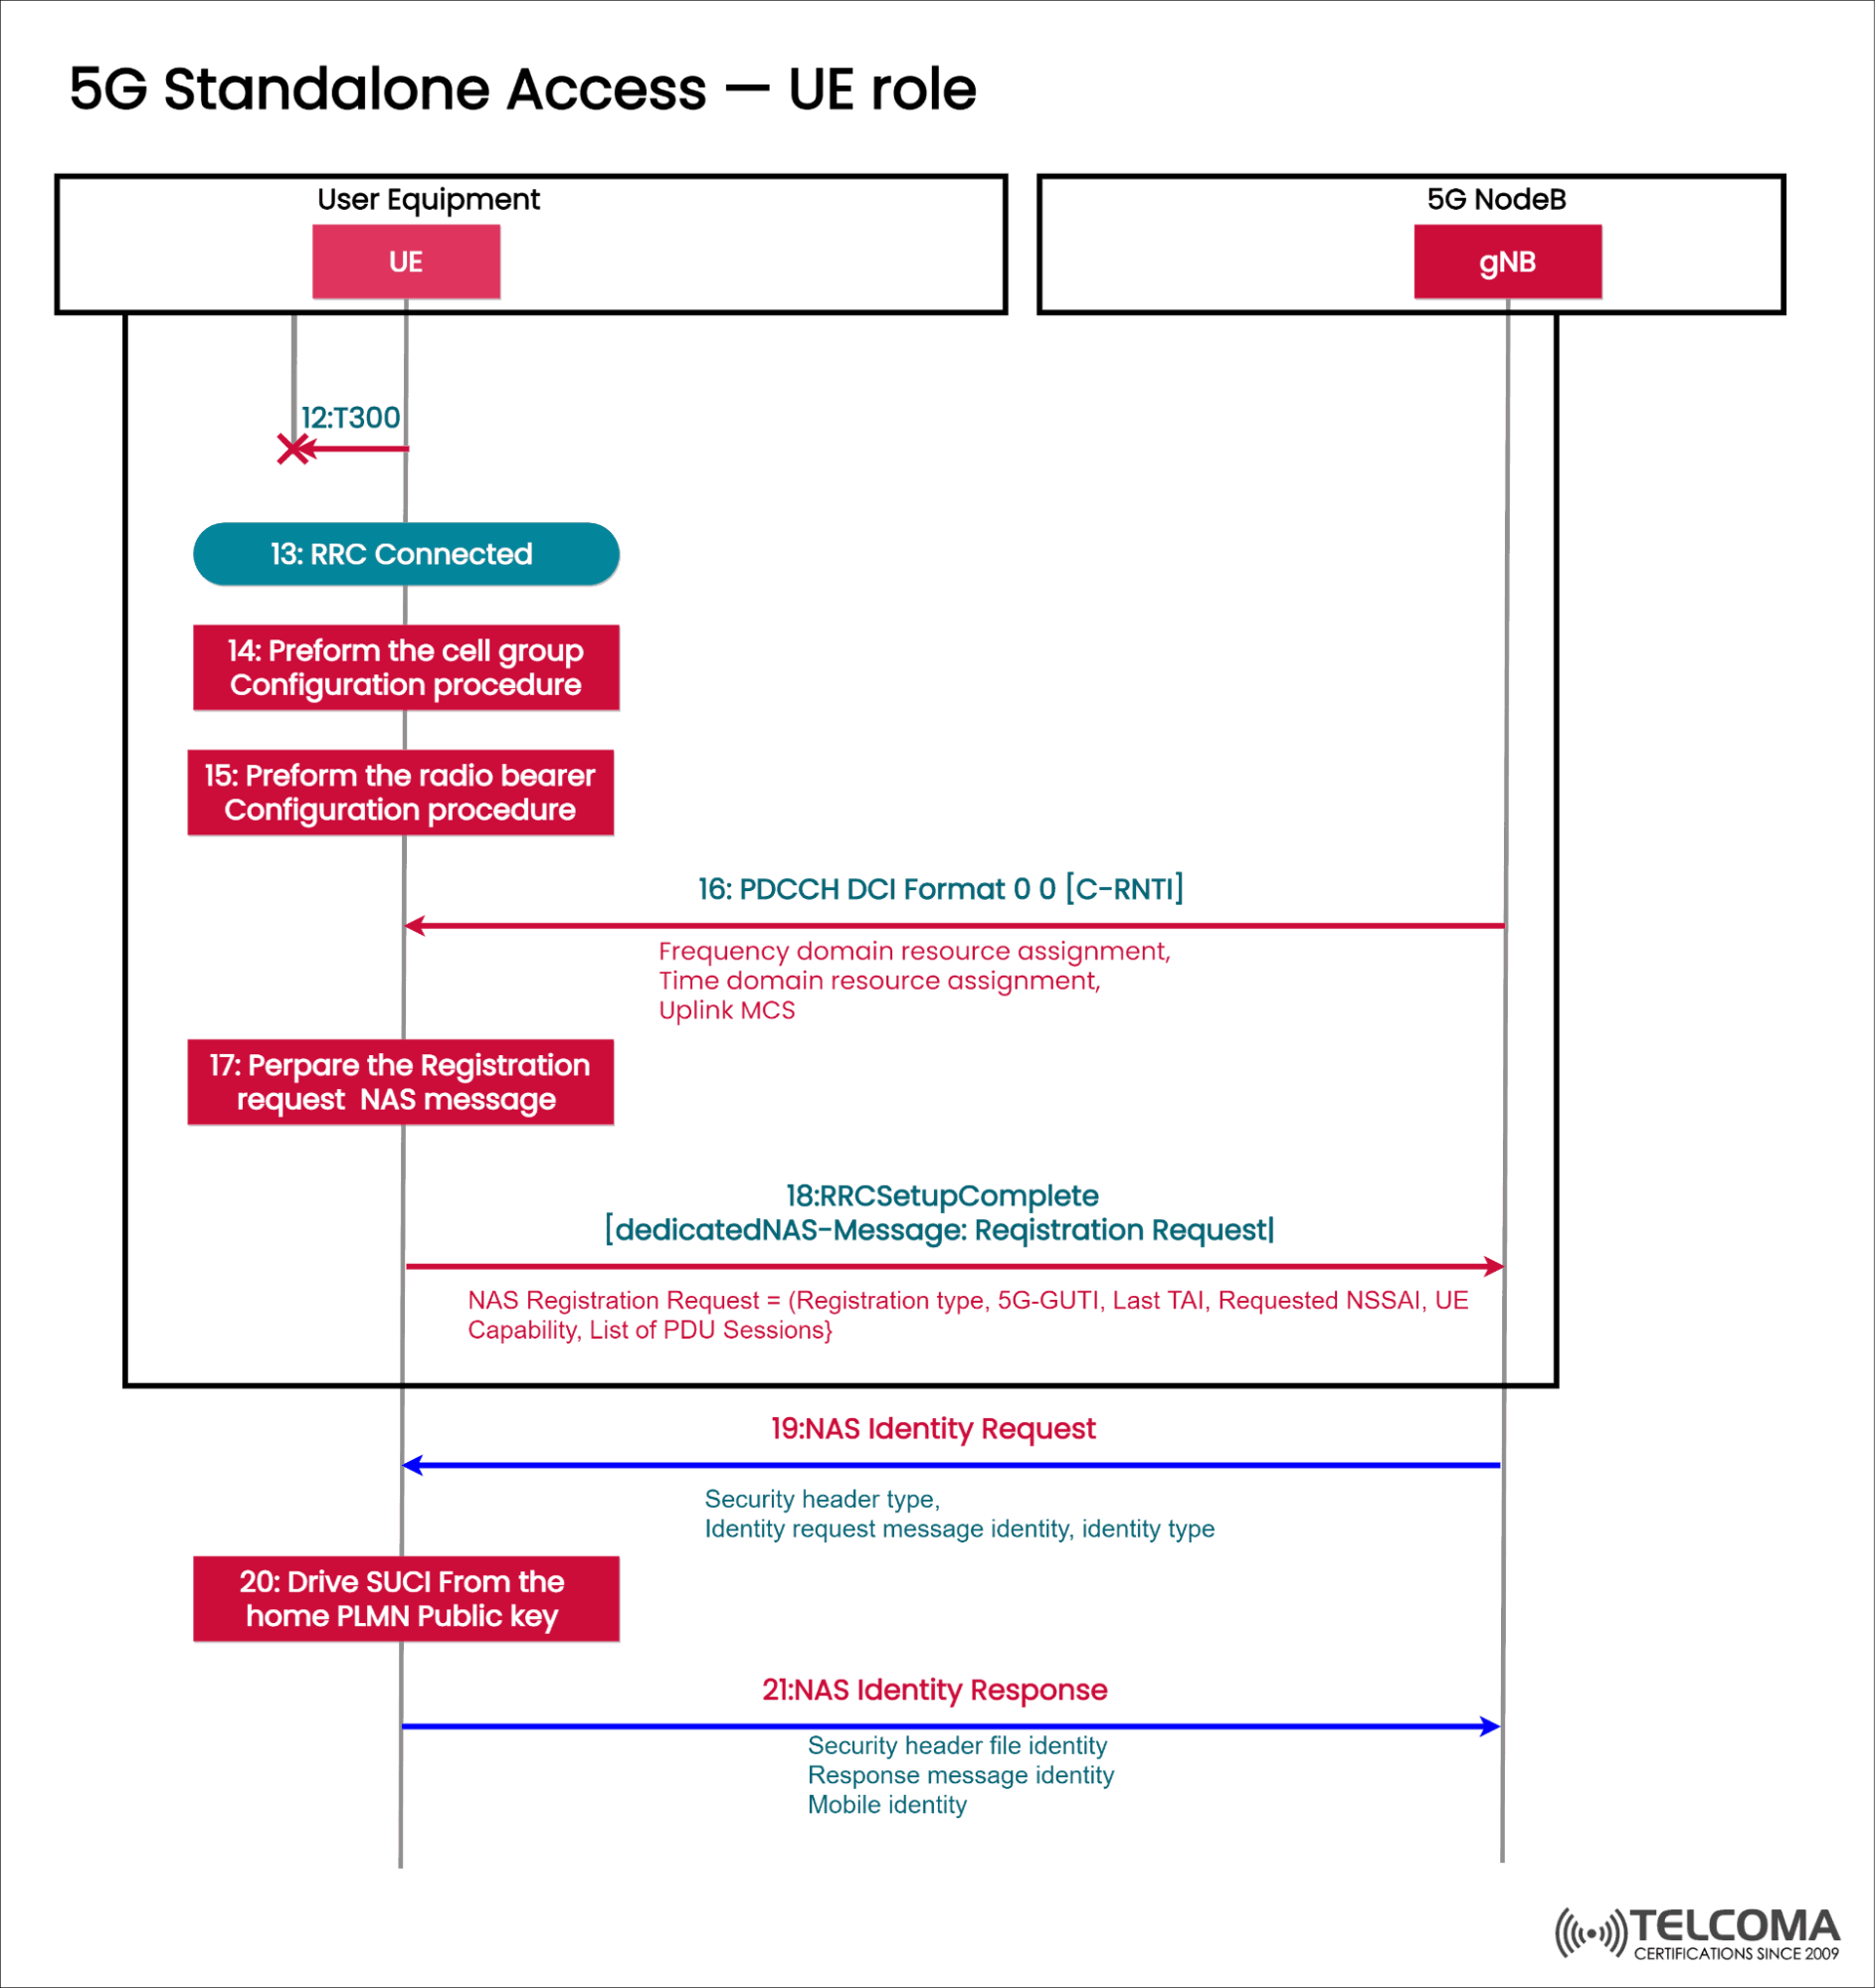 ue role in 5g standalone access